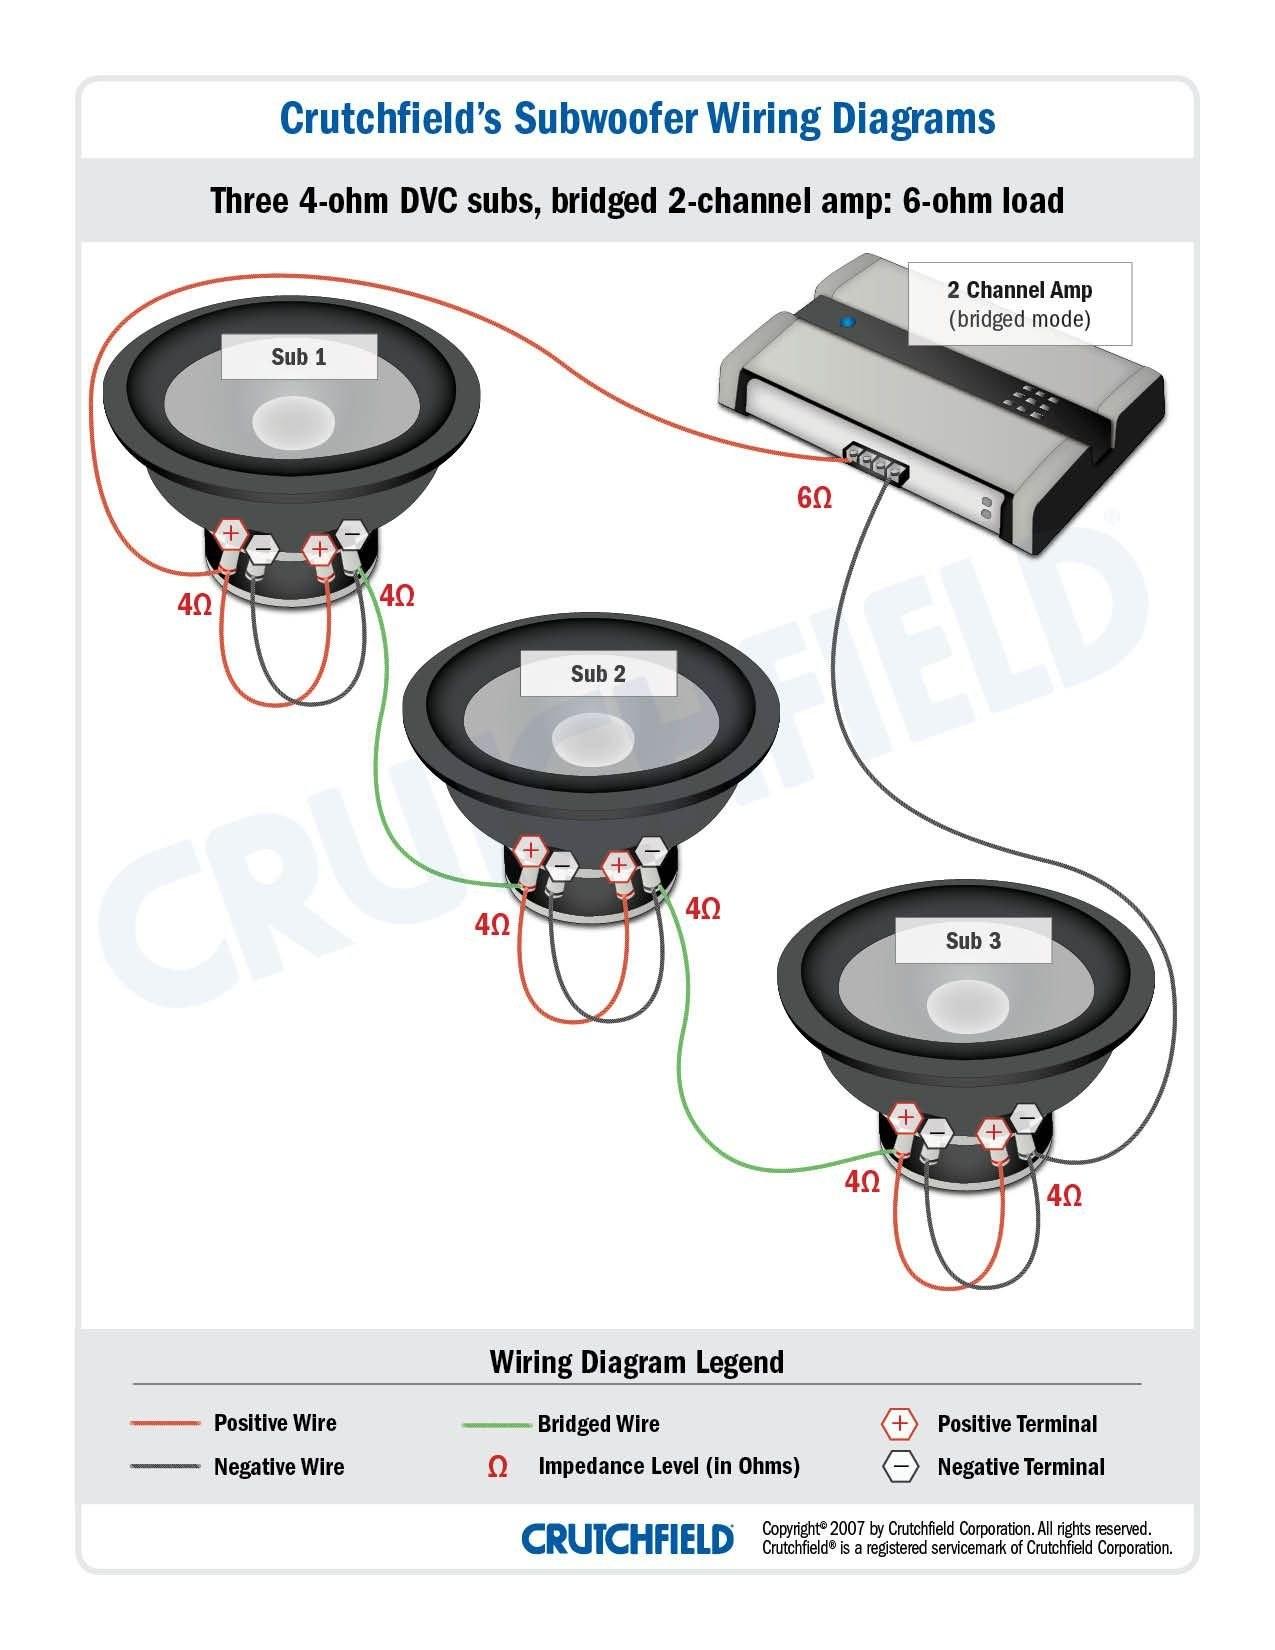 Rockford Fosgate Wiring Diagram New Top 10 Subwoofer Free Download 3 - Rockford Fosgate Wiring Diagram